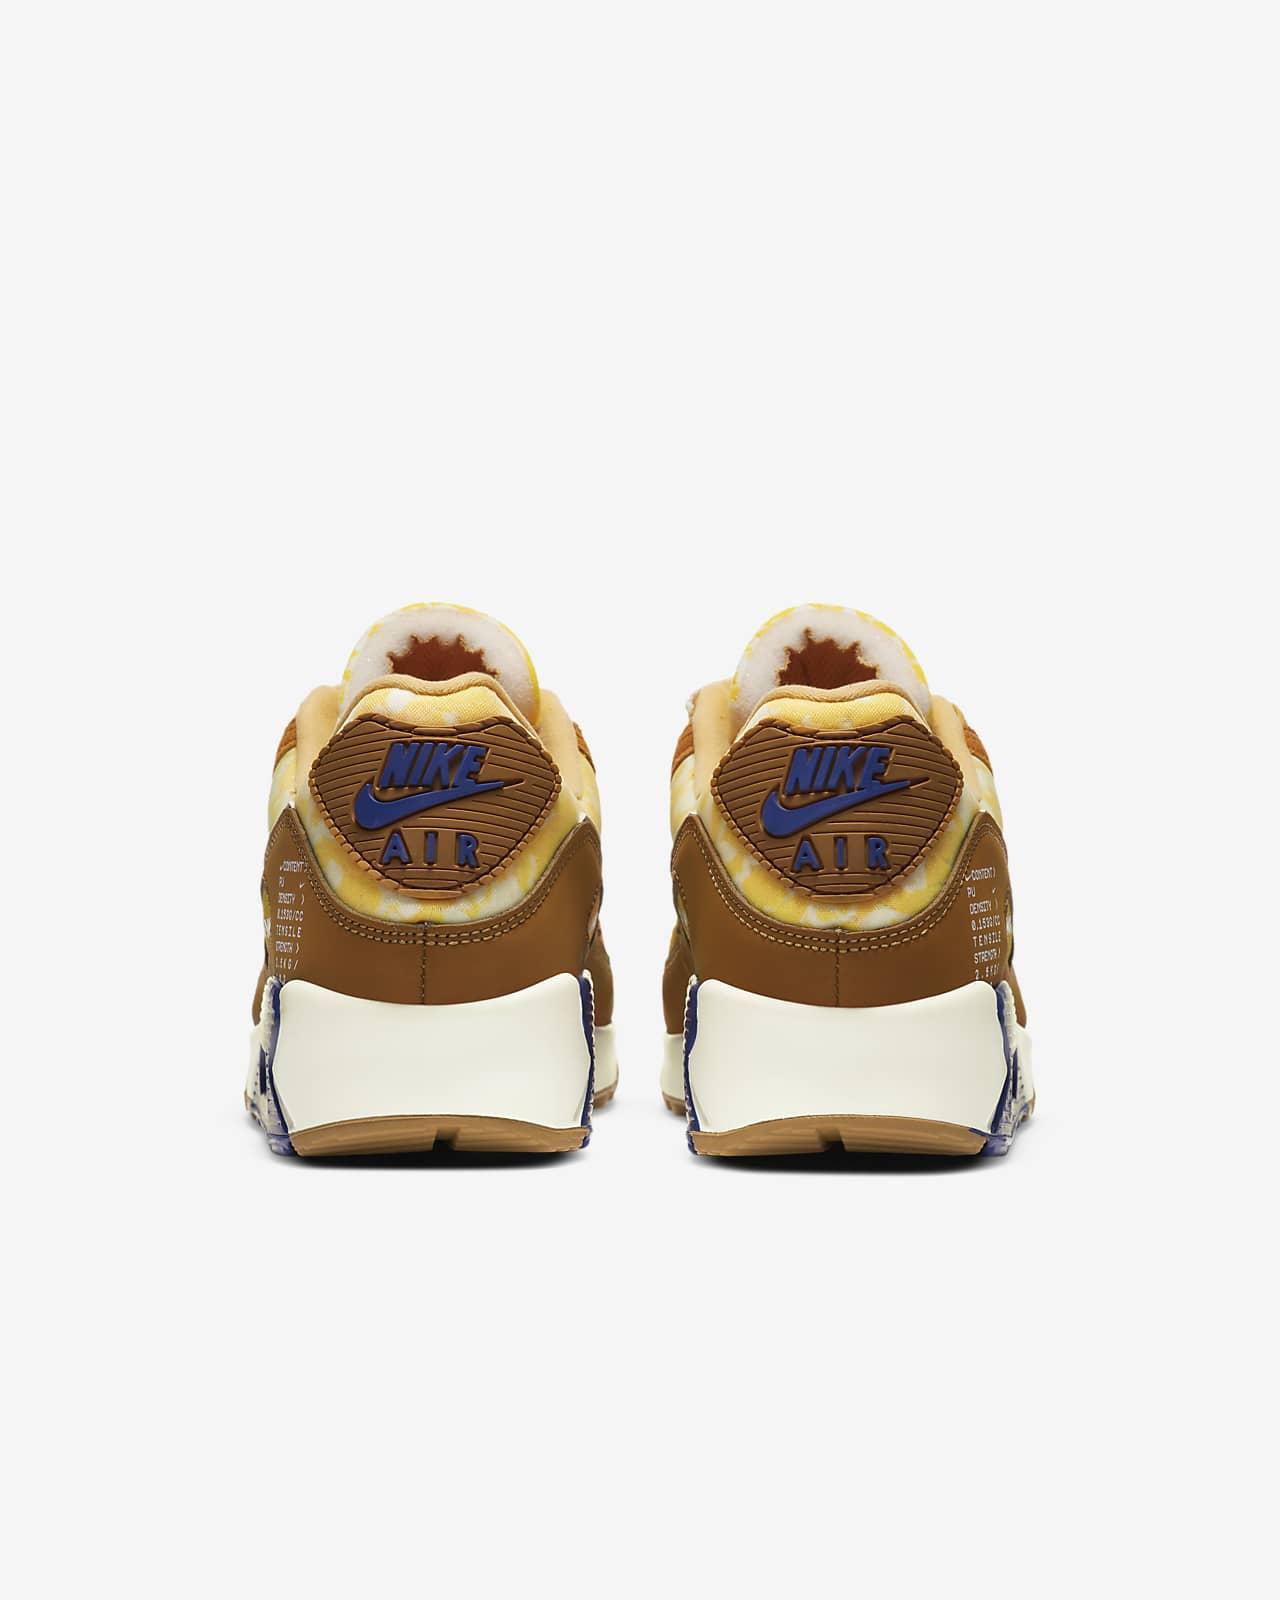 nike zapatos hombre beige